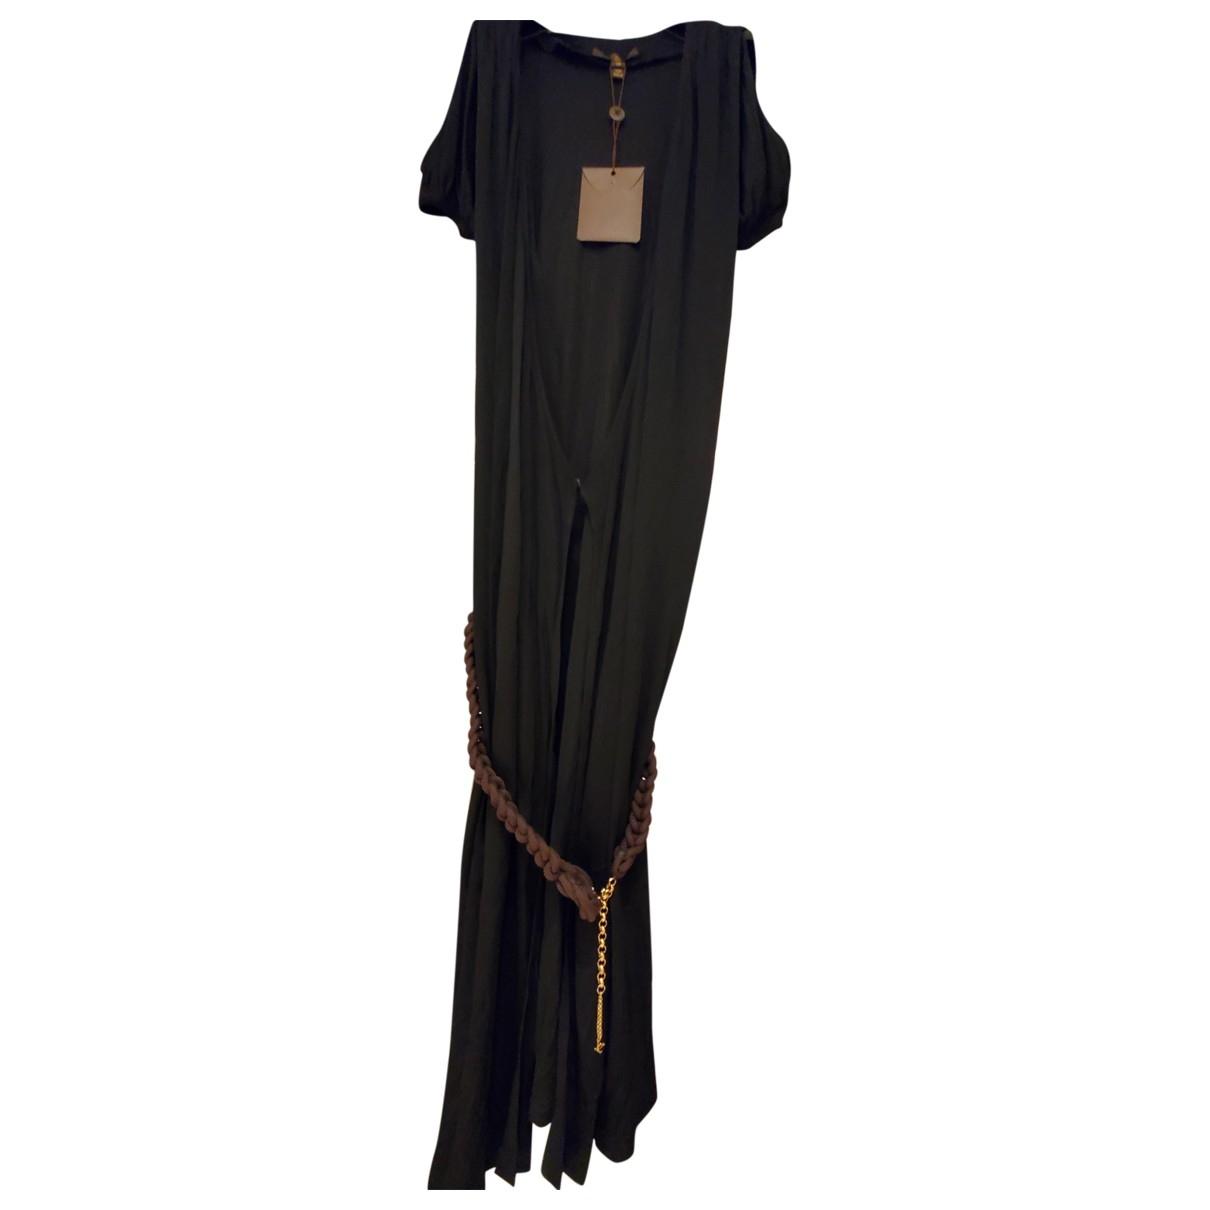 Louis Vuitton \N Black dress for Women 36 FR